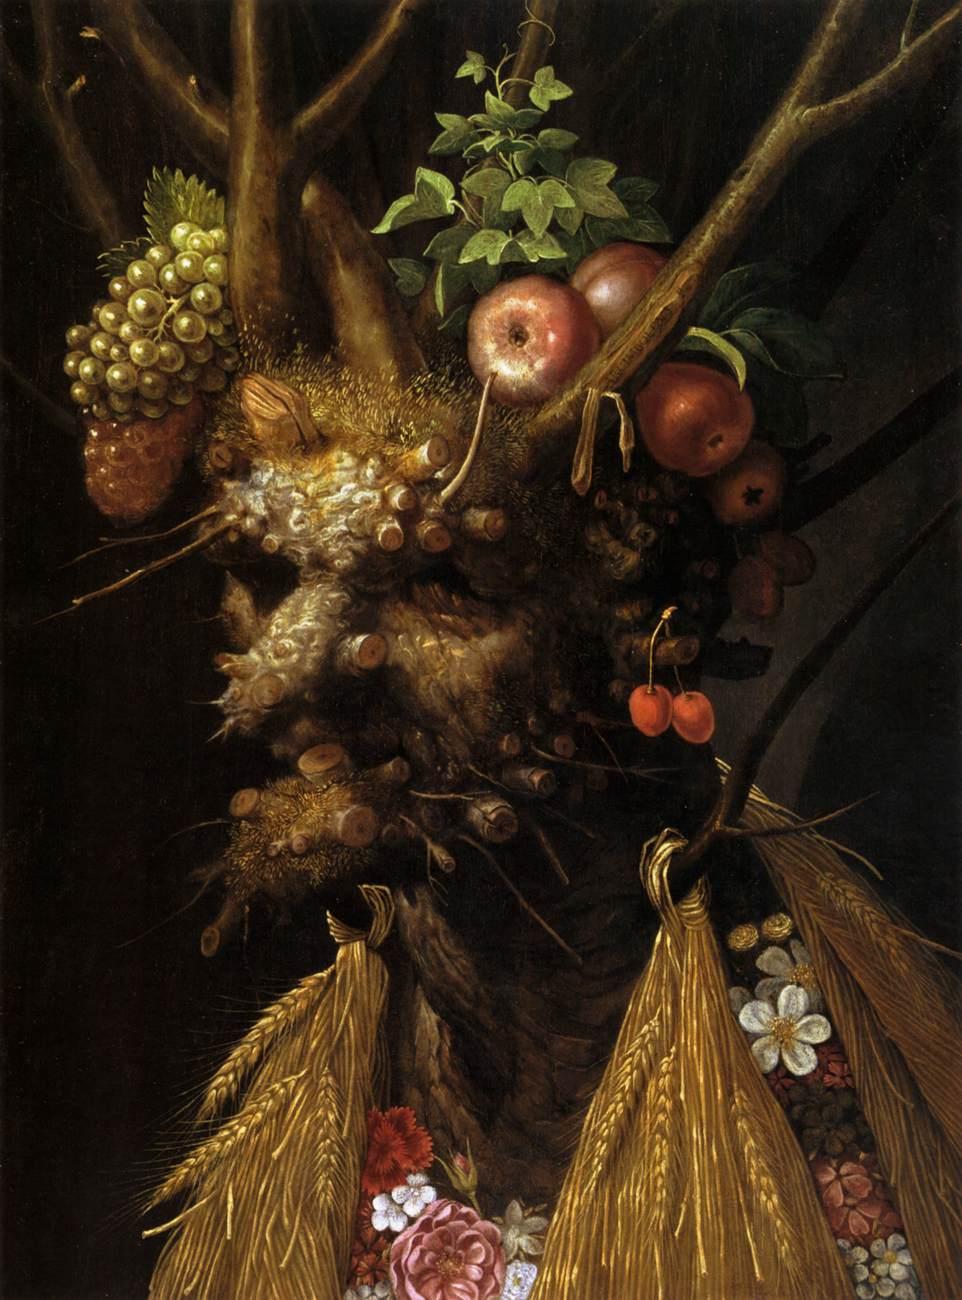 Giuseppe Arcimboldo - The Four Seasons In One Head